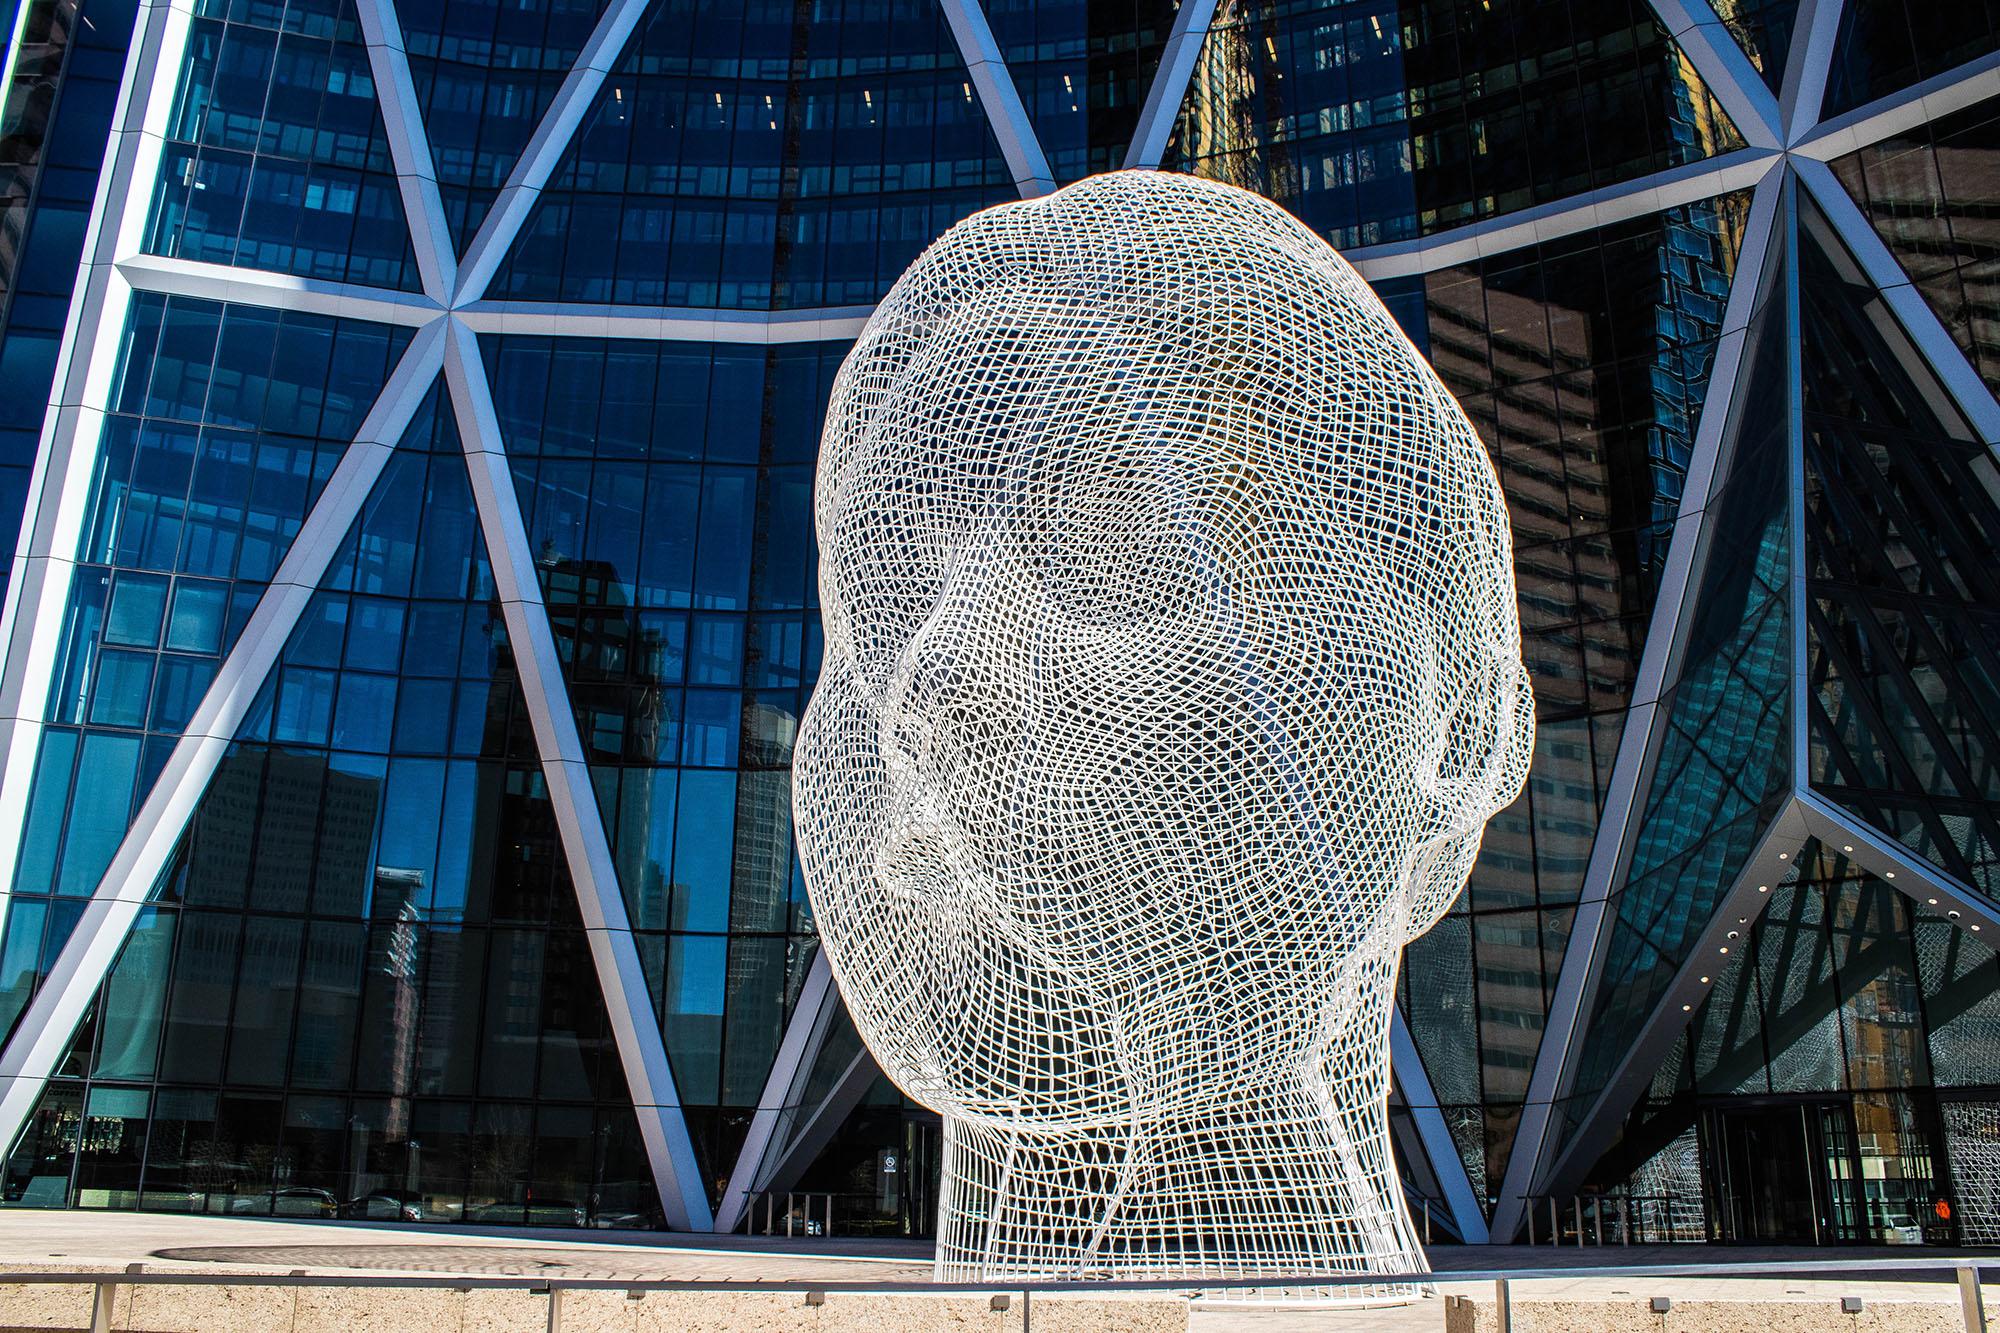 Wonderland Sculpture - La tête, Calgary